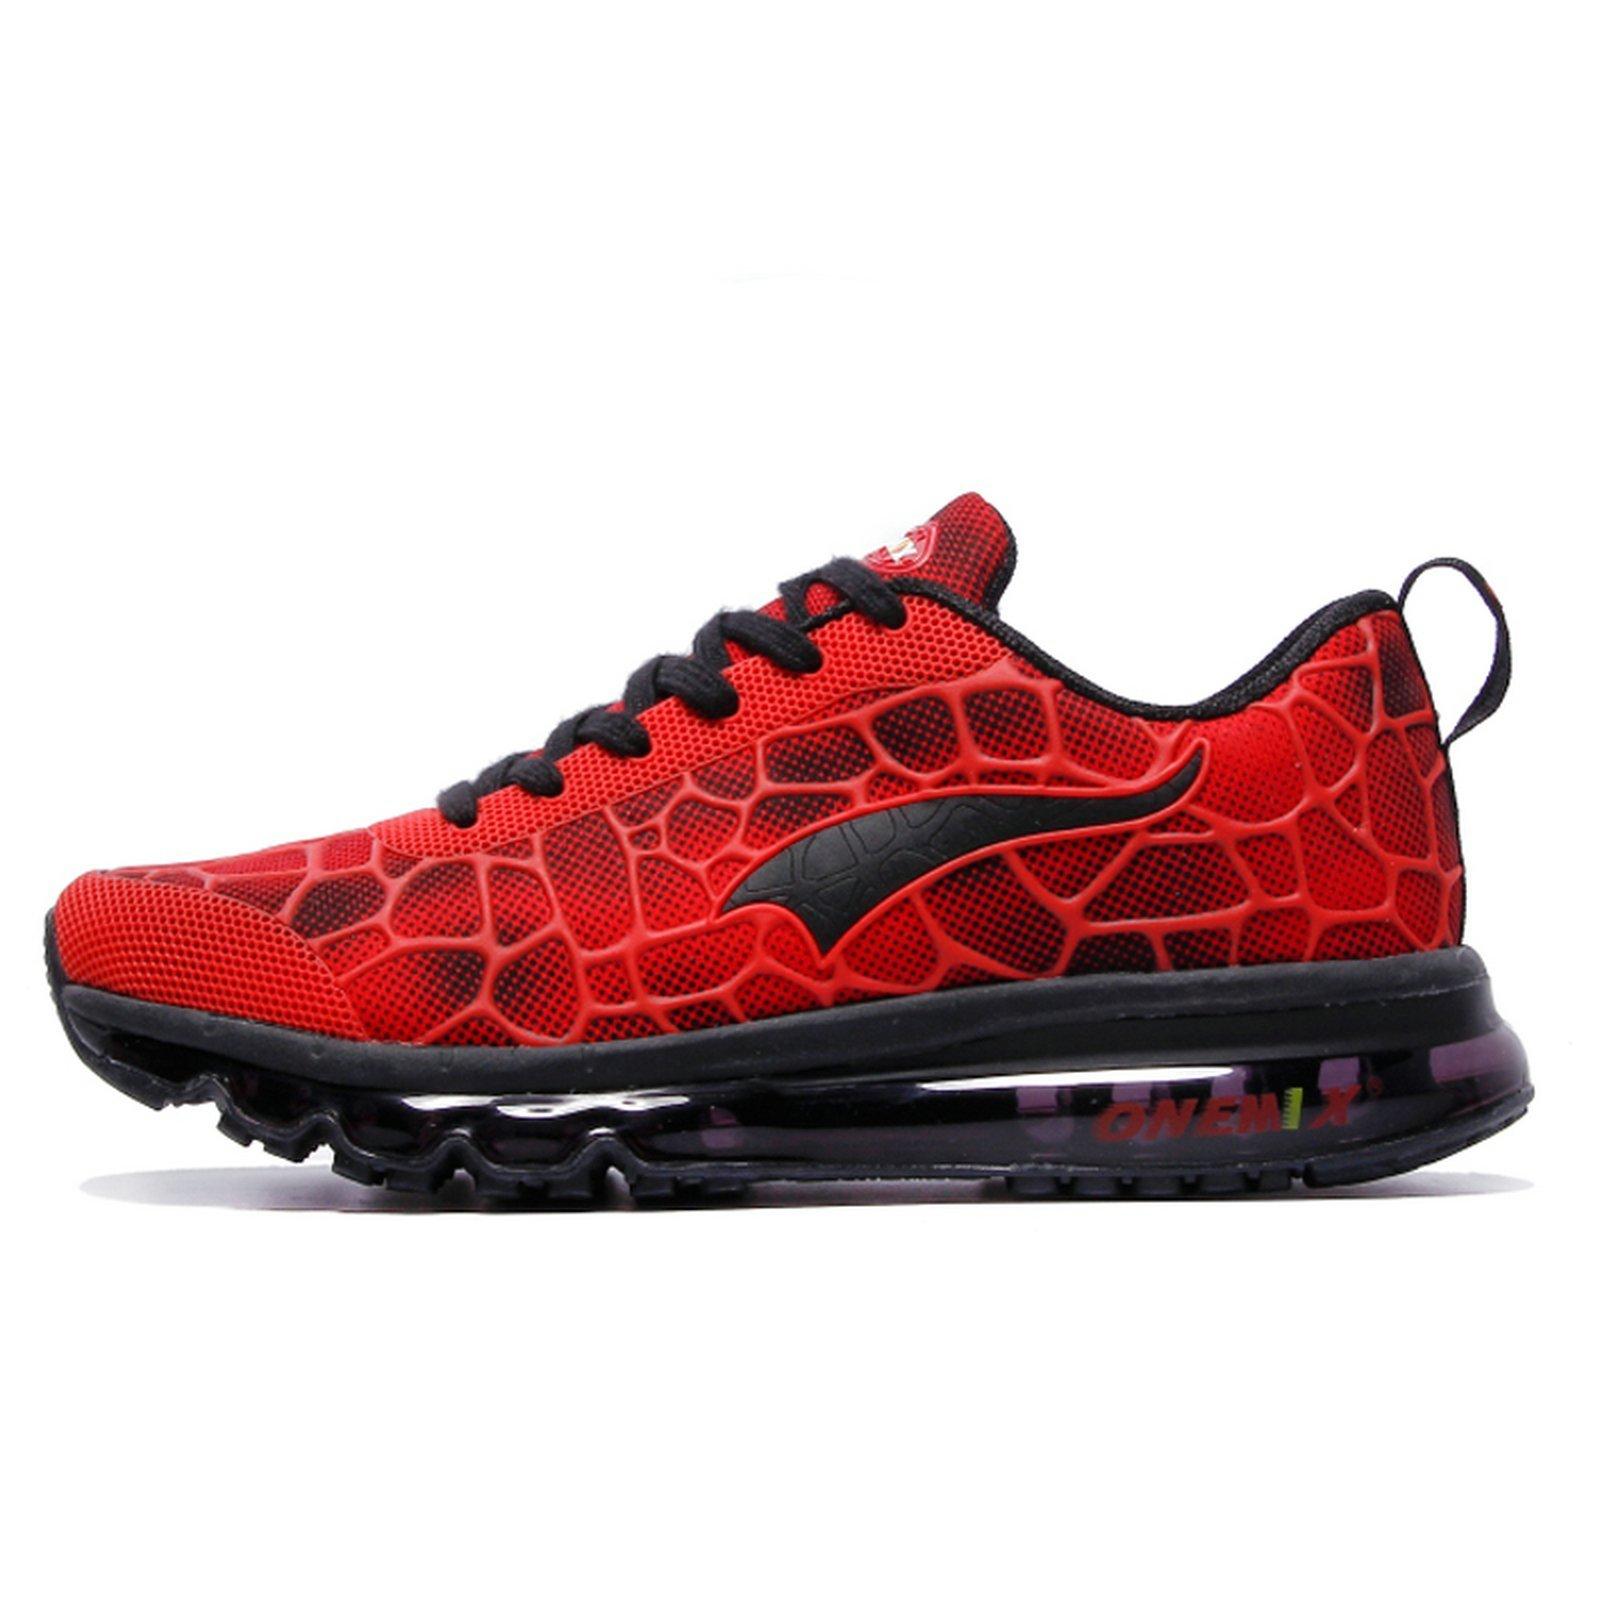 ONEMIX Men's Lightweight Air Cushion Sport Running Shoes Red Black Size 9.5